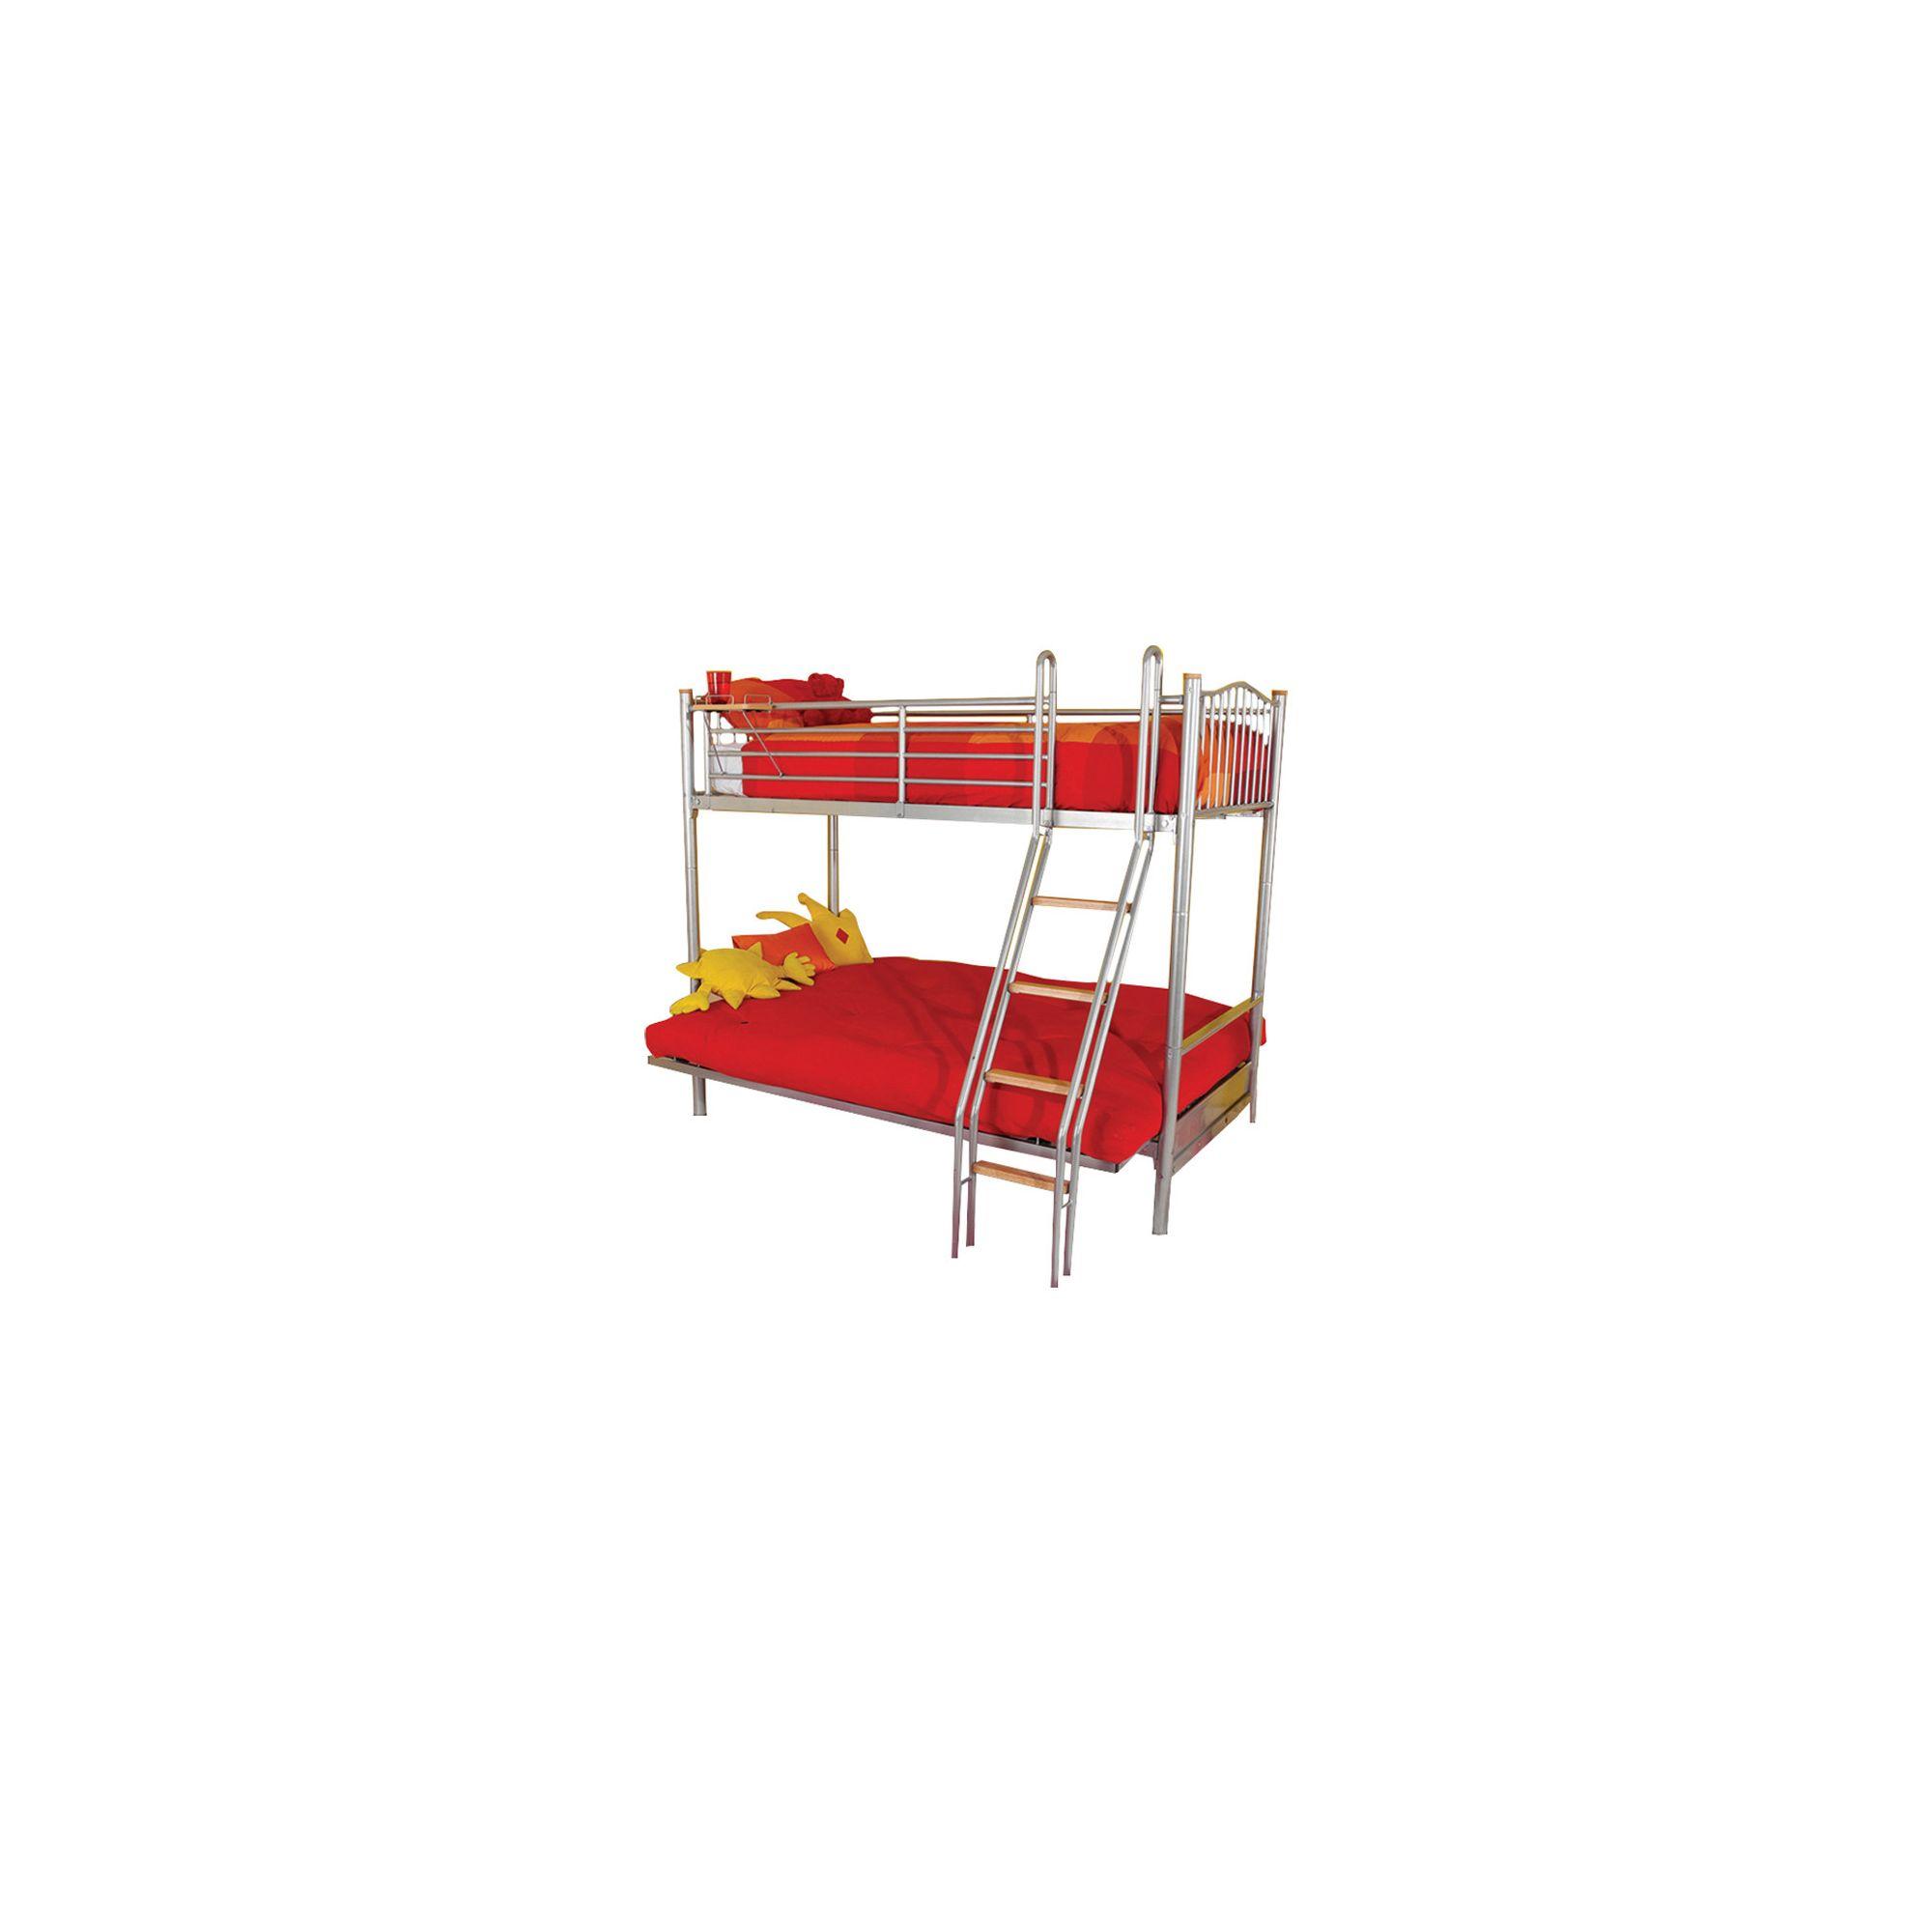 Hyder Alaska Futon Bunk Bed - Denim at Tesco Direct